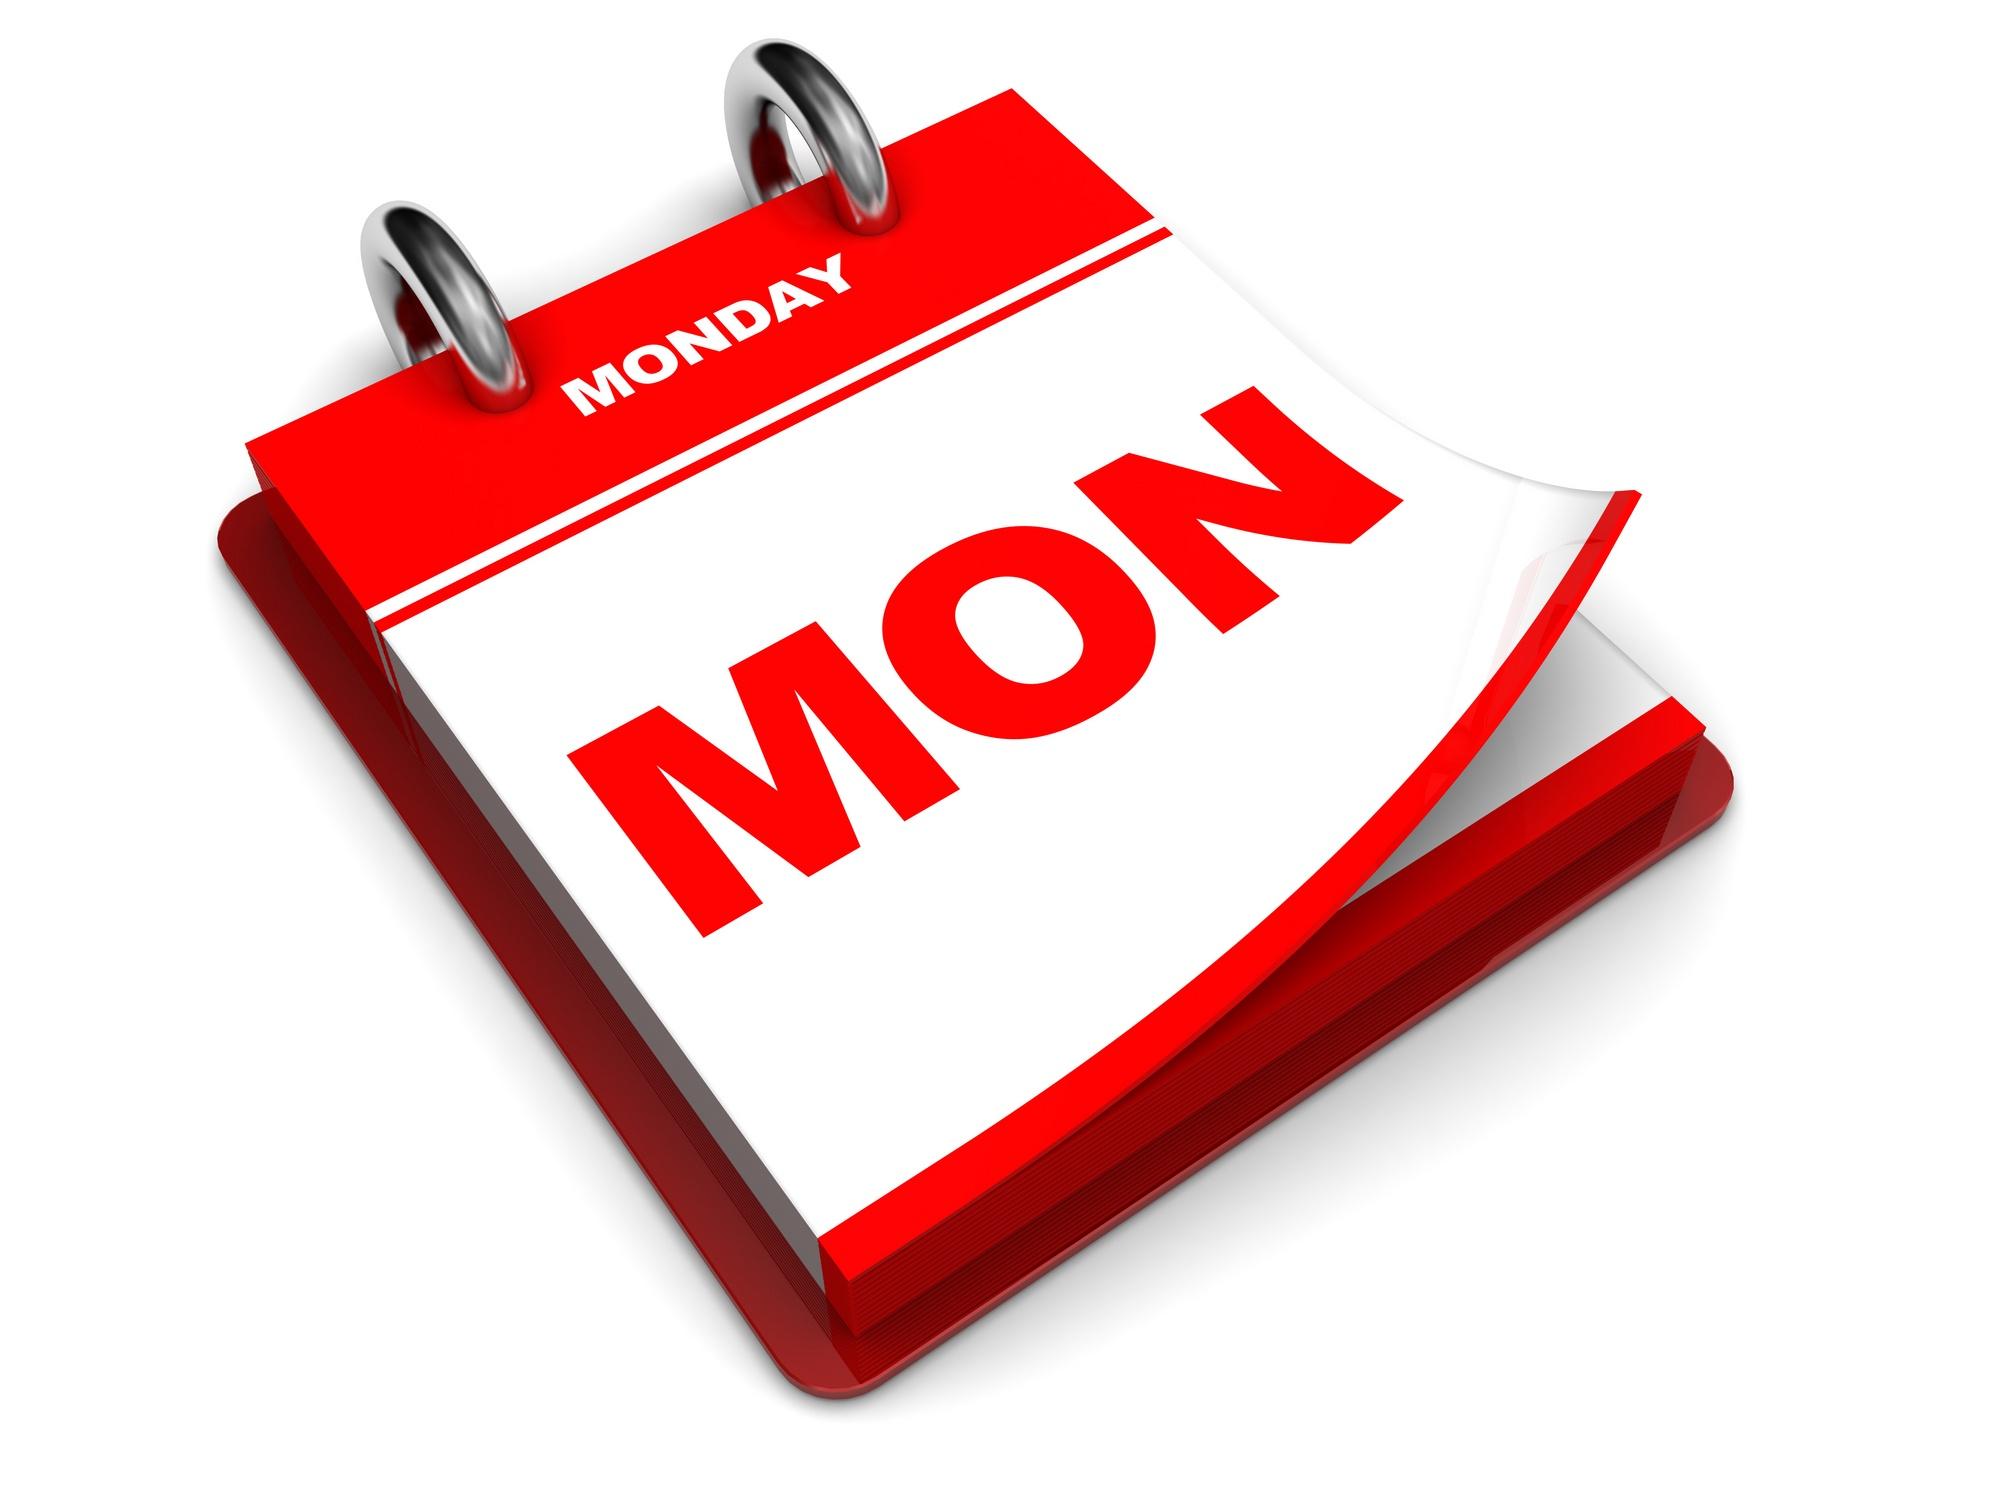 Lunedì